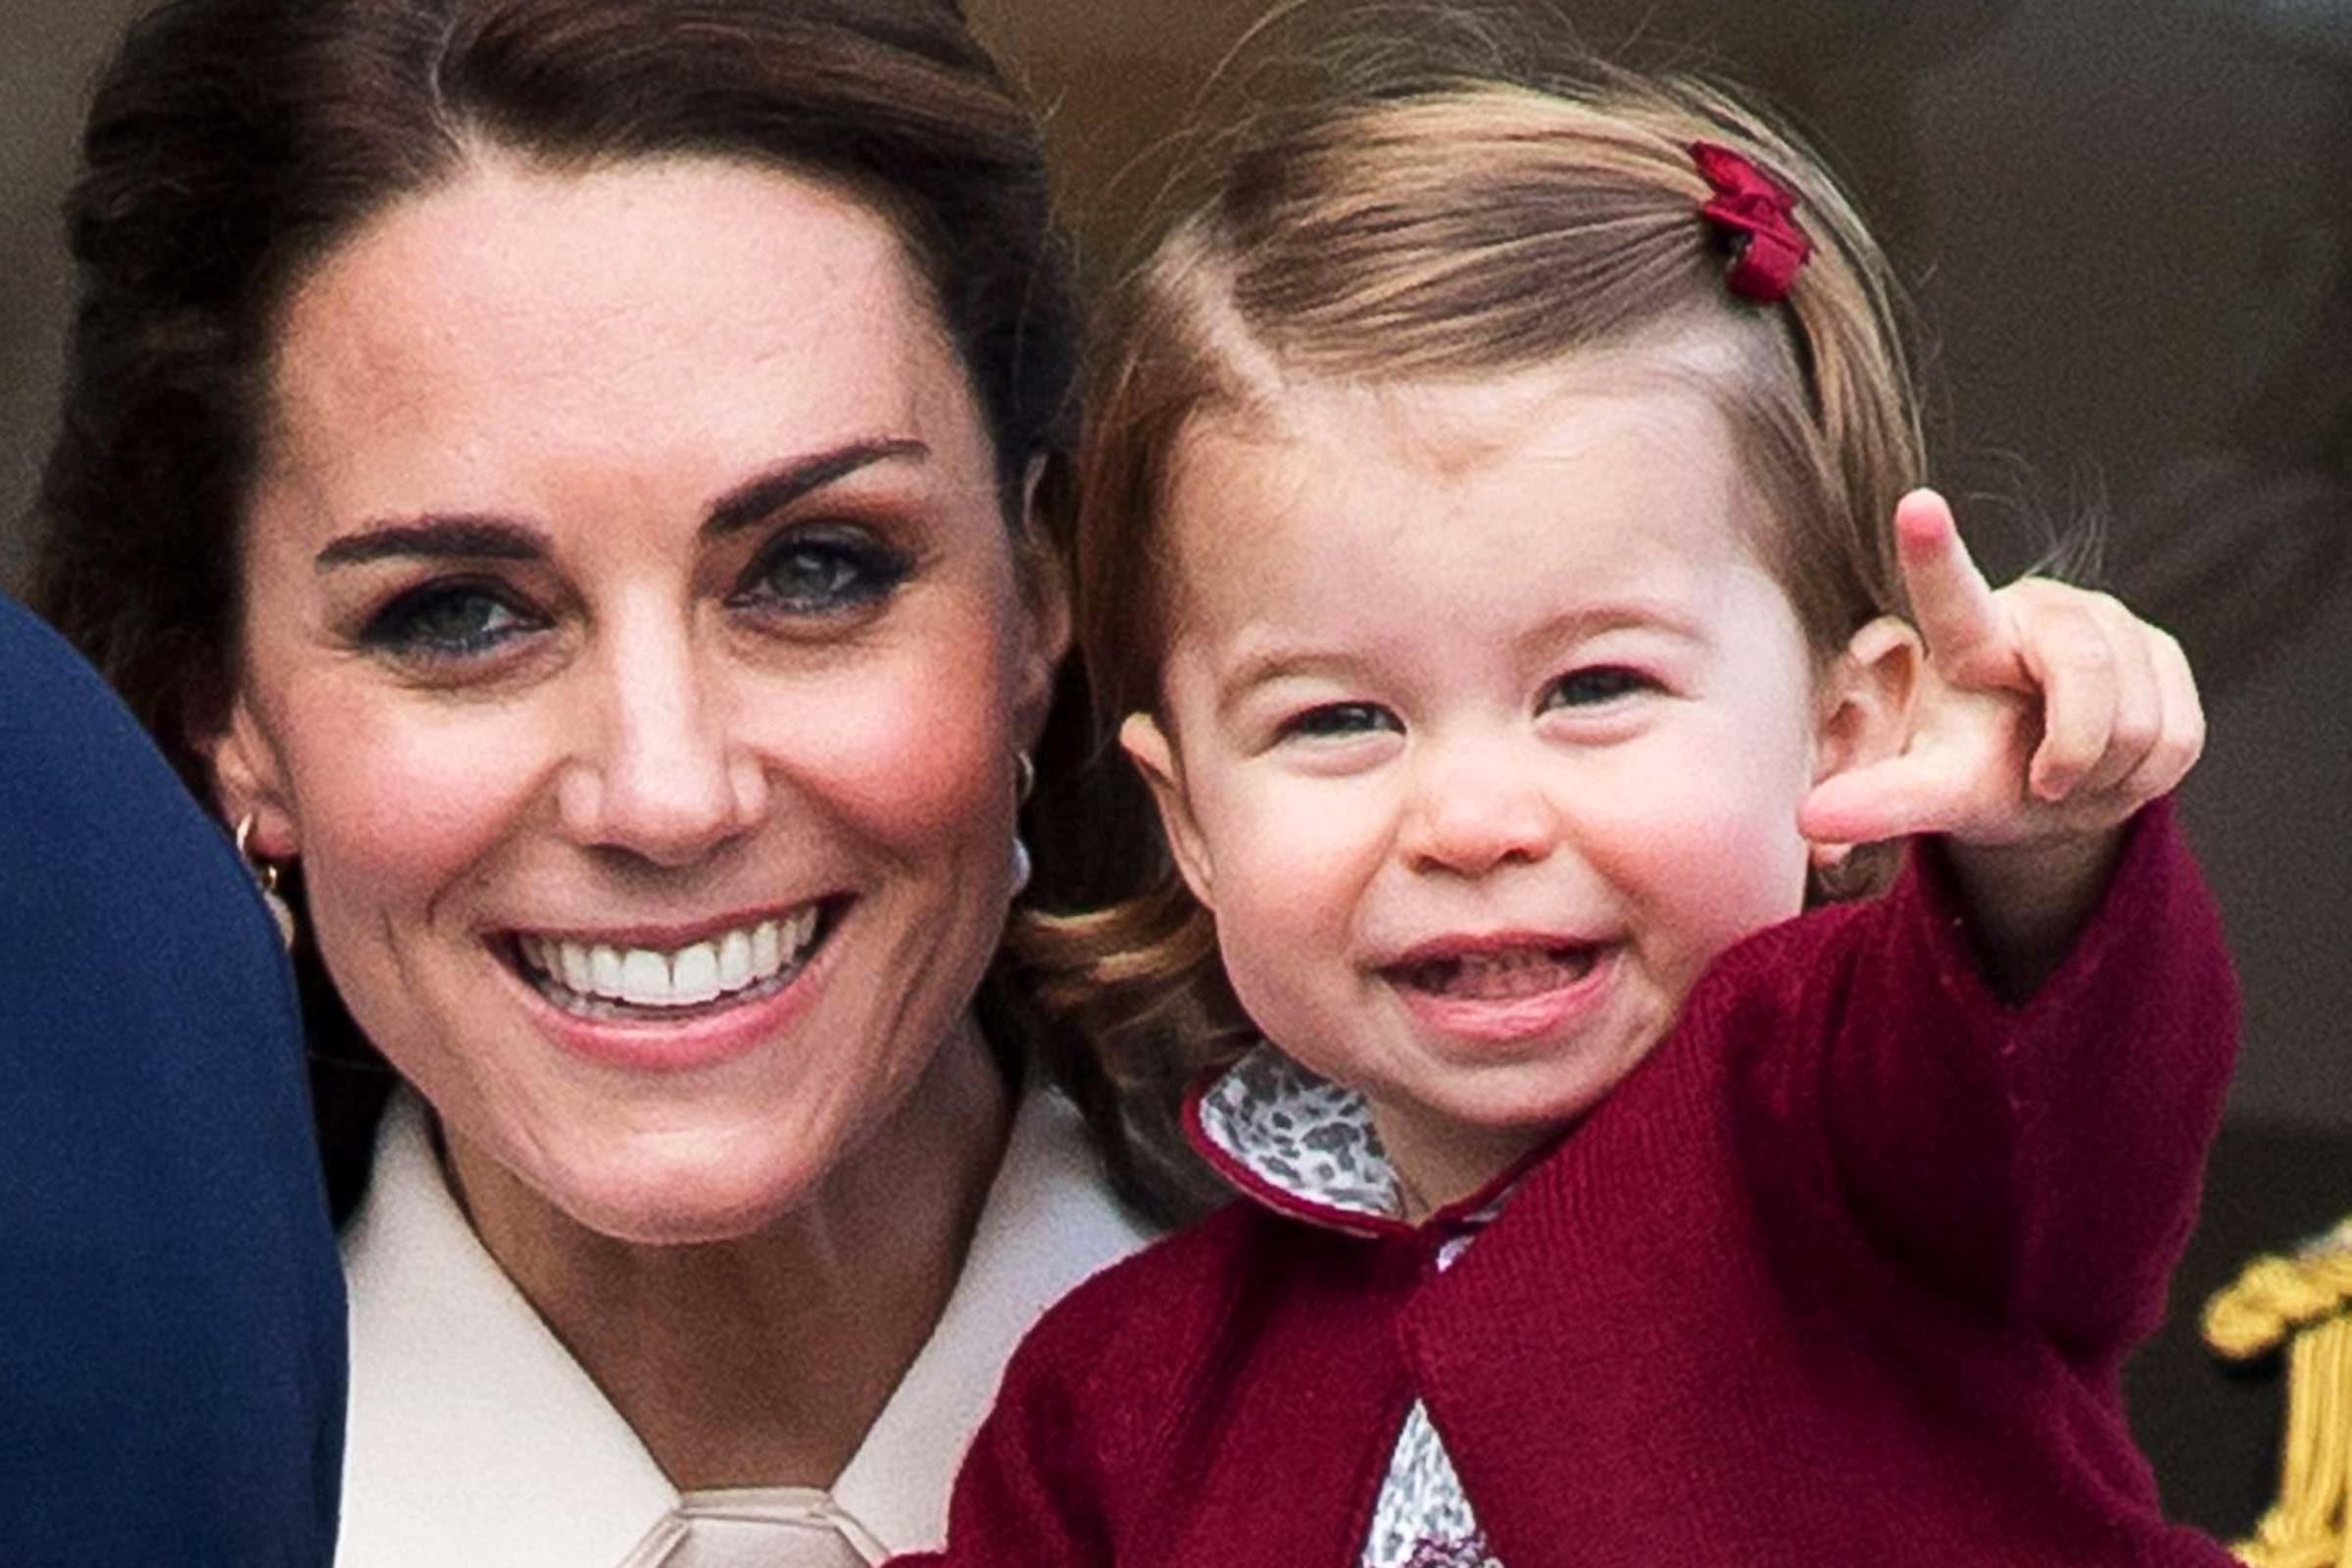 La Princesse Charlotte aime la caméra